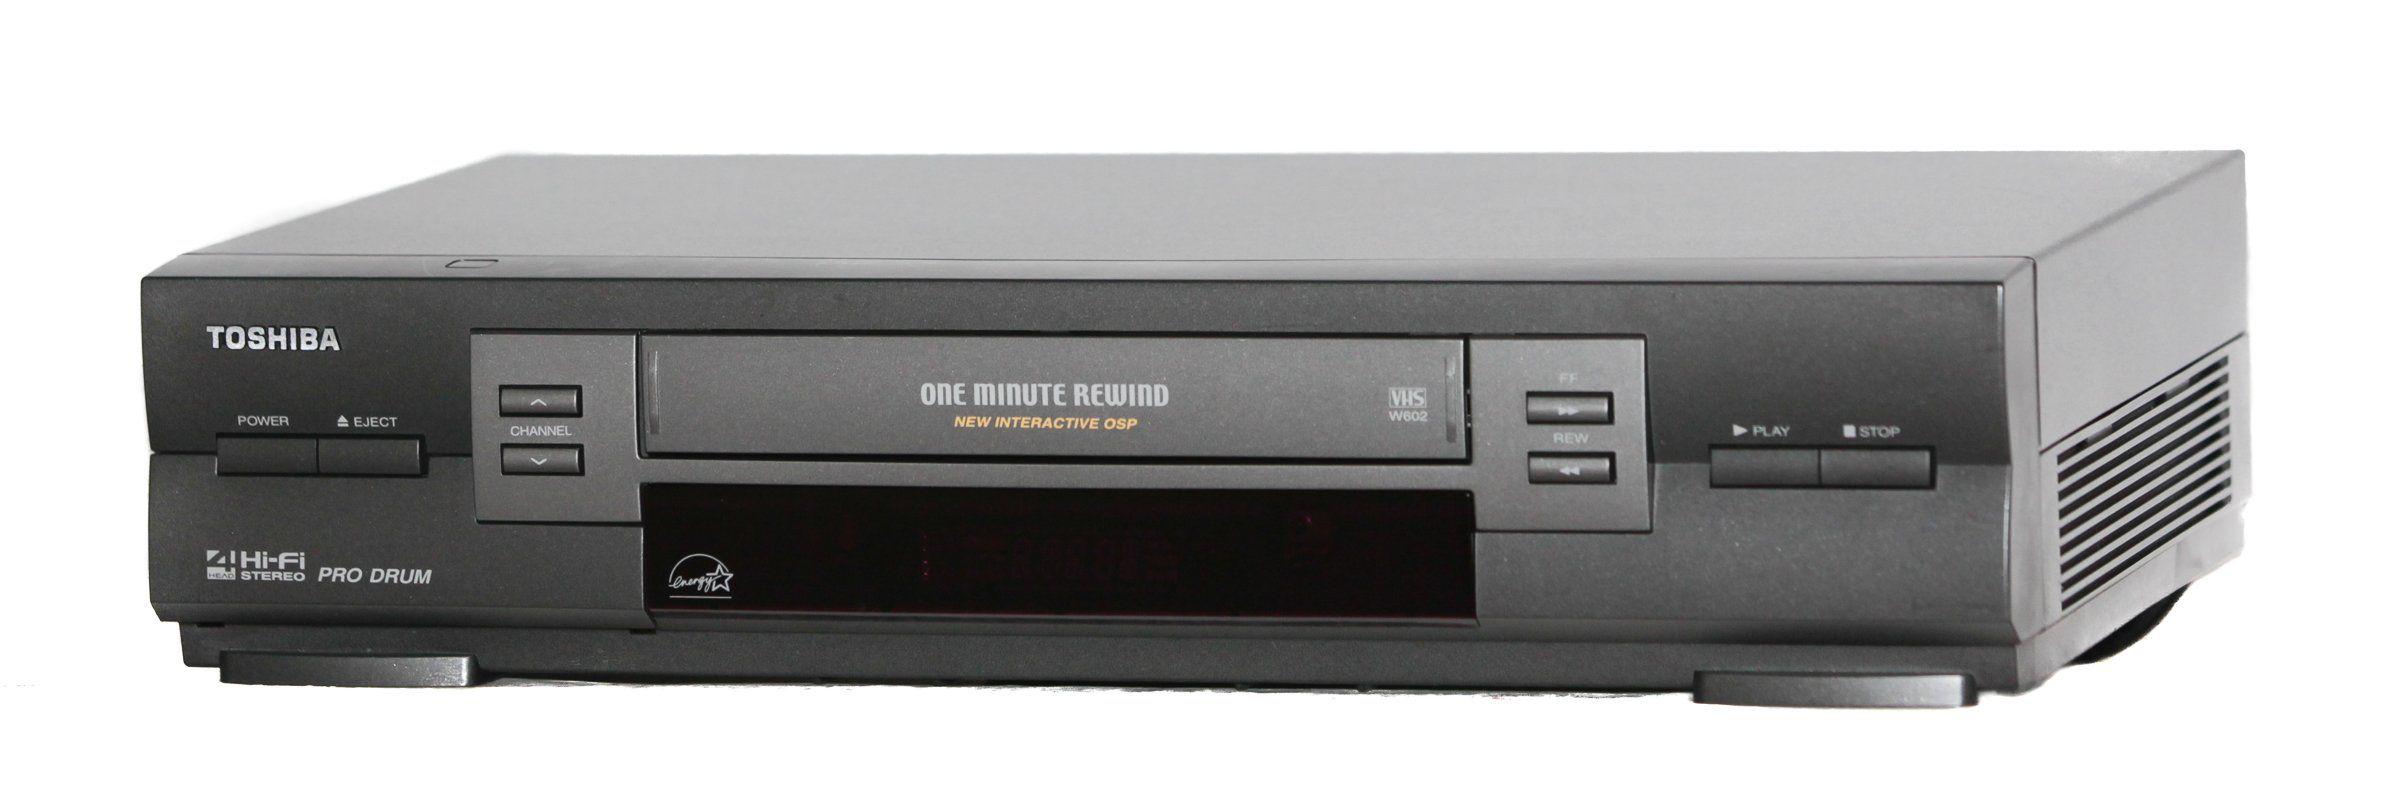 Toshiba W 602 Hi Fi Stereo Vcr Toshiba Hifi Vintage Electronics